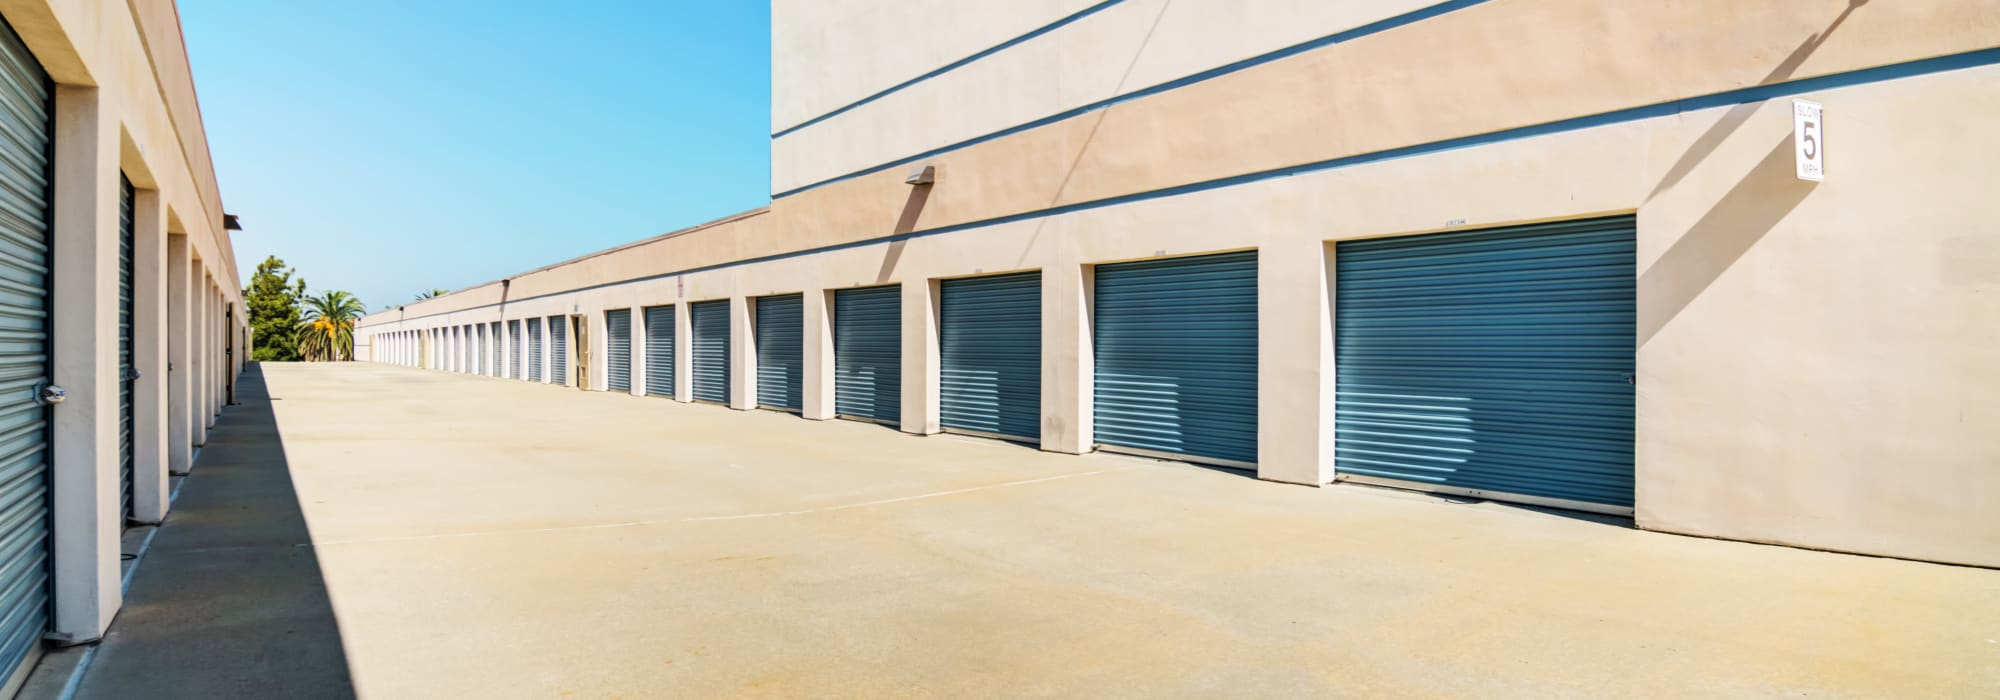 Outdoor units at Sorrento Mesa Self Storage in San Diego, California